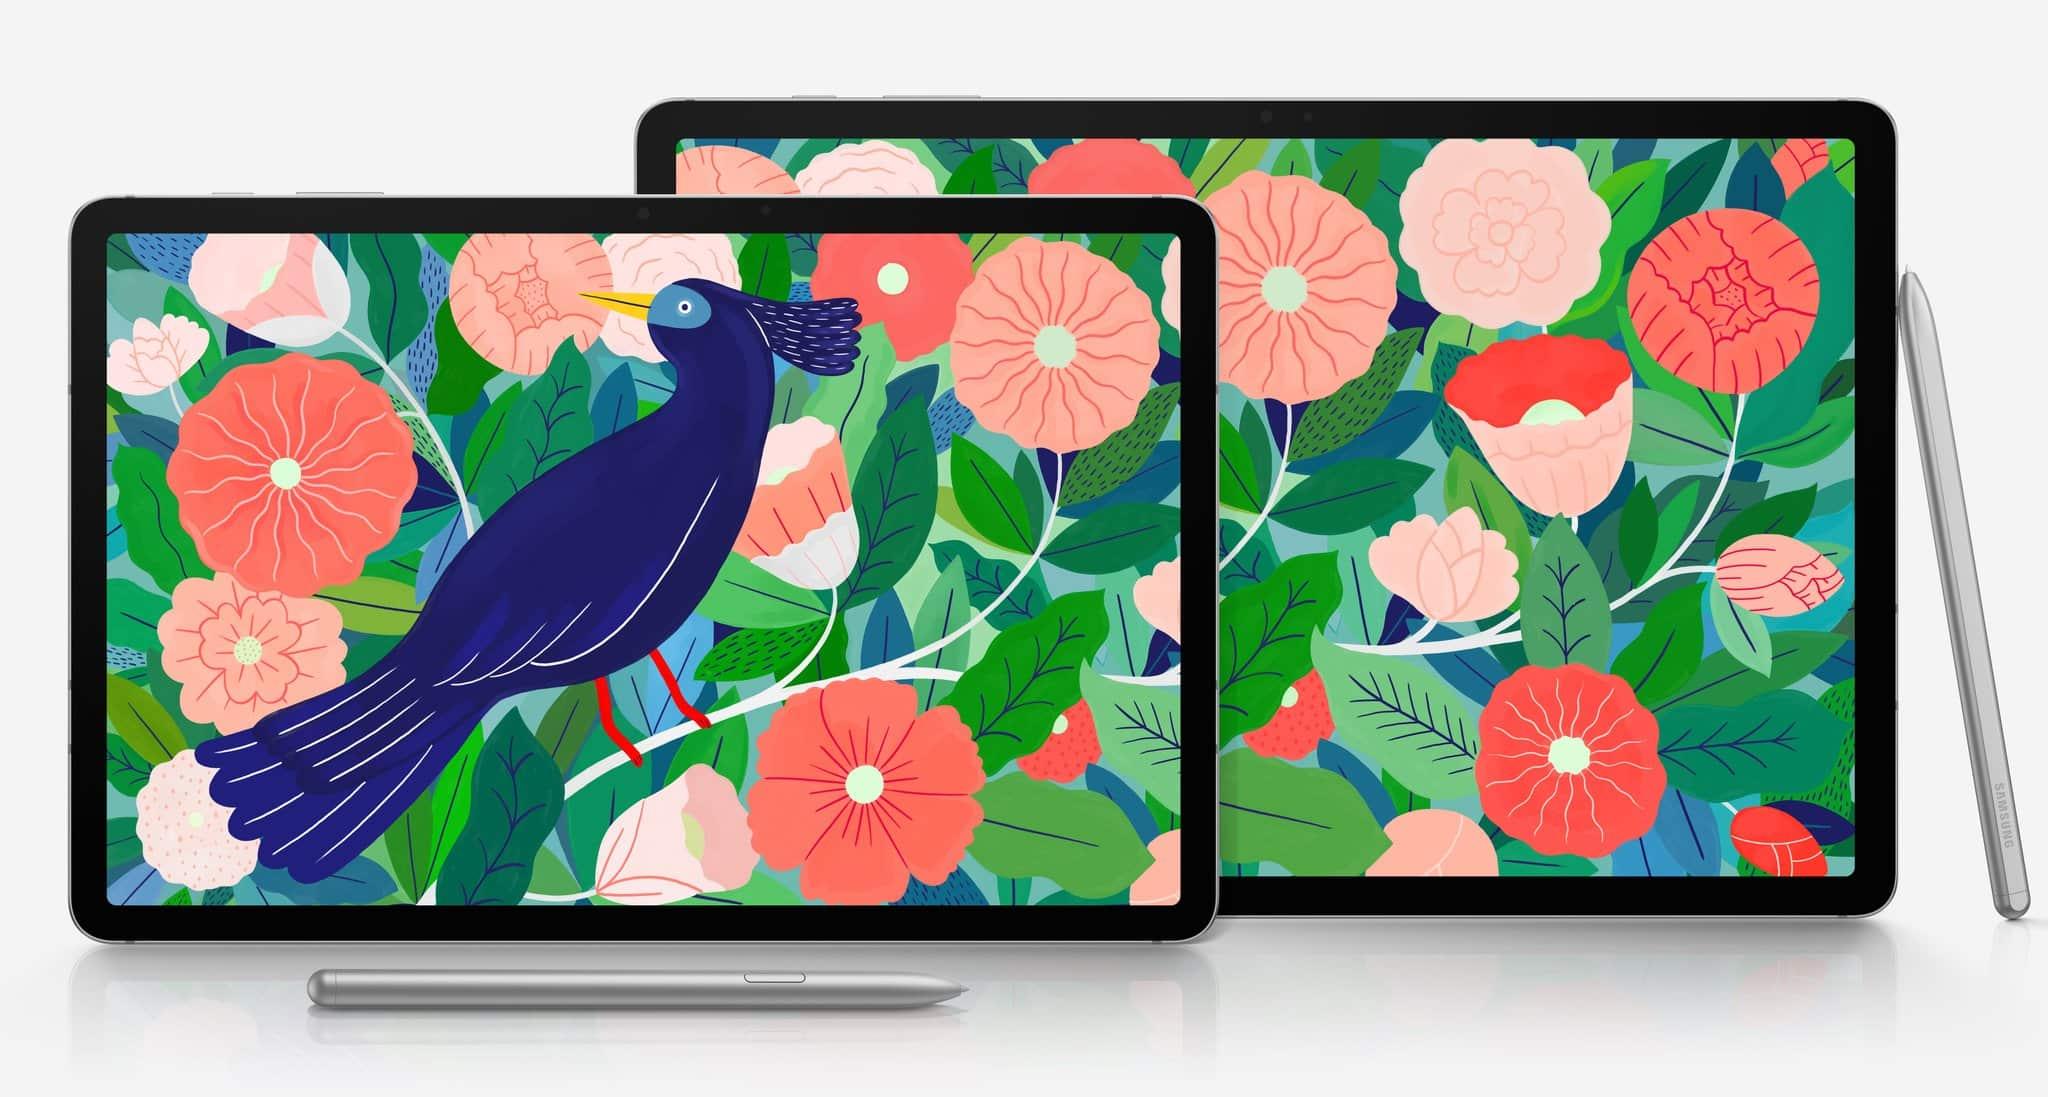 Samsung готовит к выходу планшеты Galaxy Tab S8 и Galaxy Tab S8+ с чипами Snapdragon 888 и Android 11 на борту